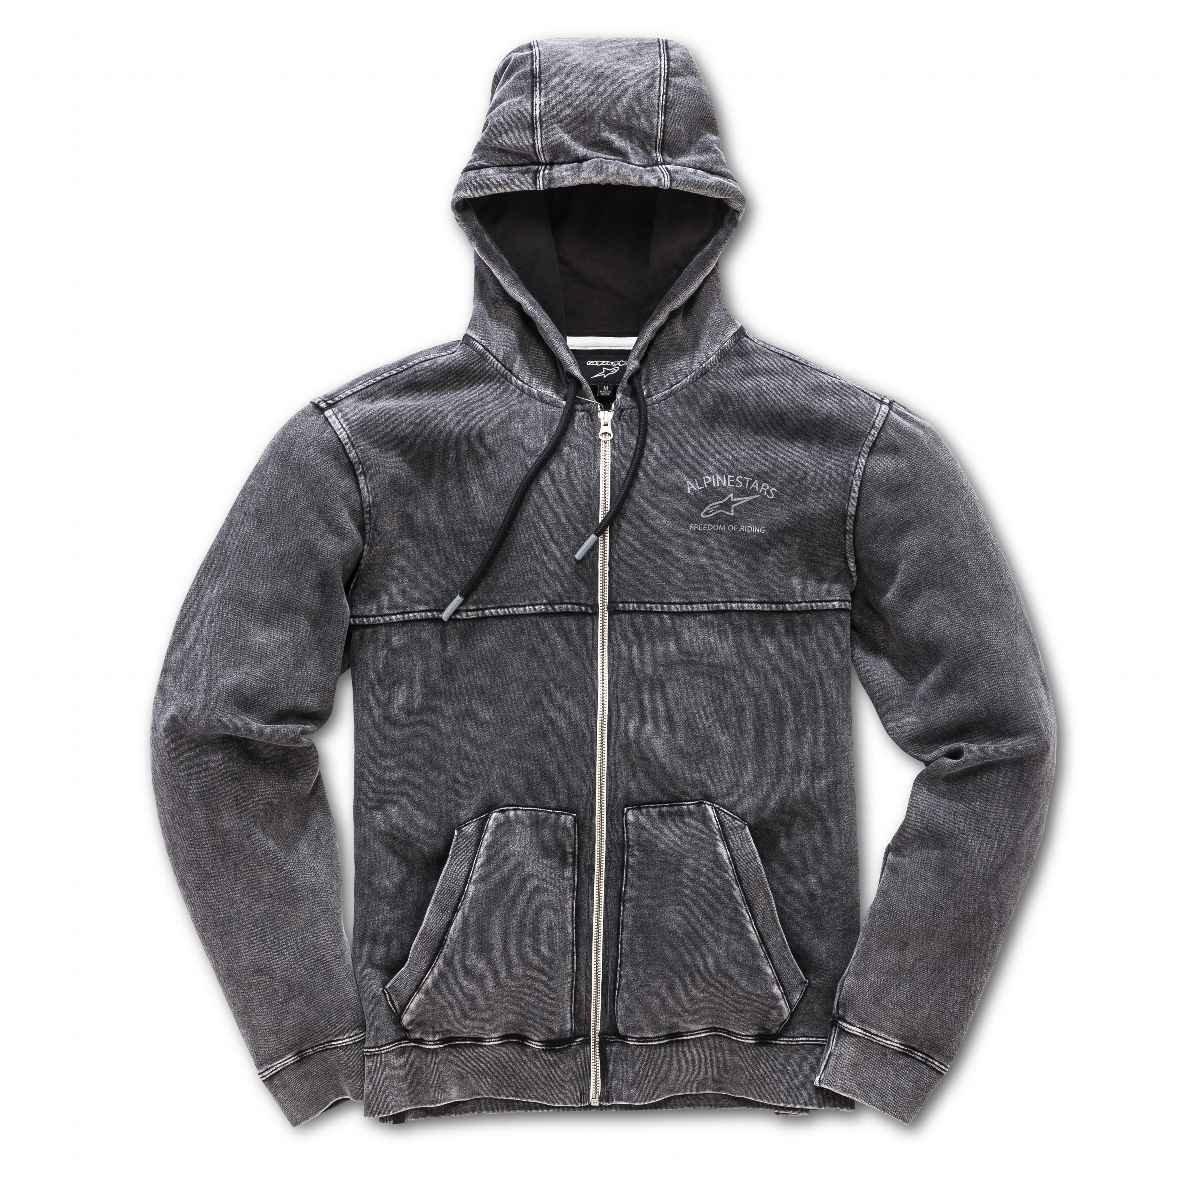 Alpinestars 1018 – 53002 Sweatshirt Kapuzenpullover Herren